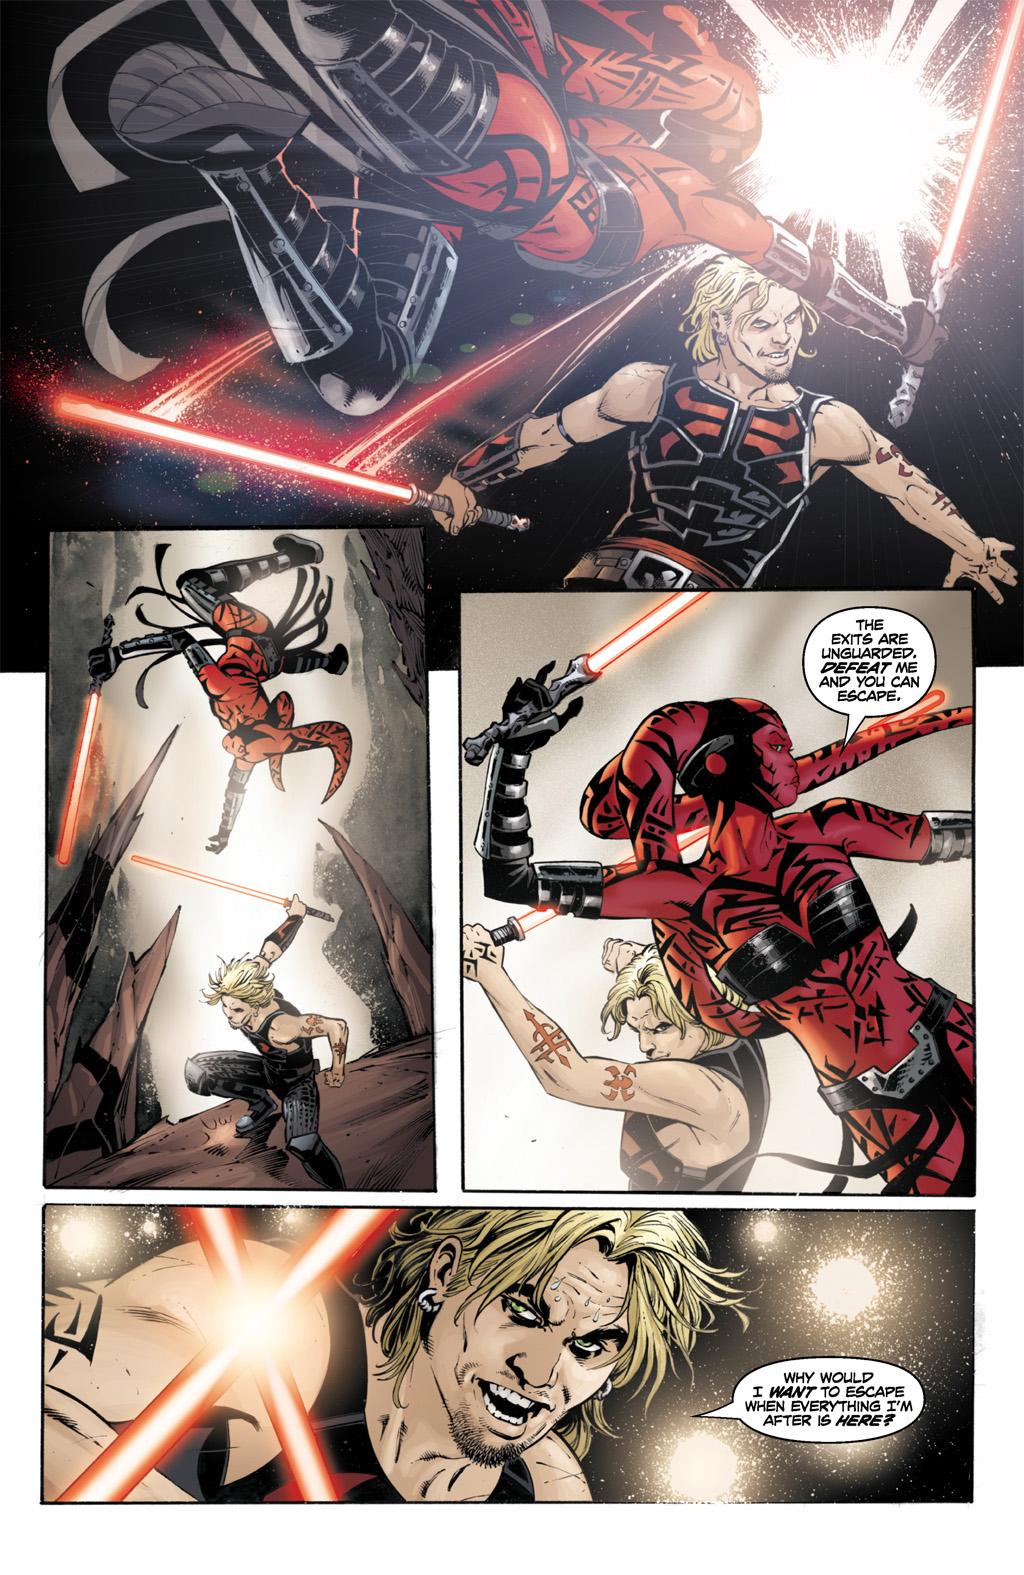 Cade Skywalker Spars With Darth Talon